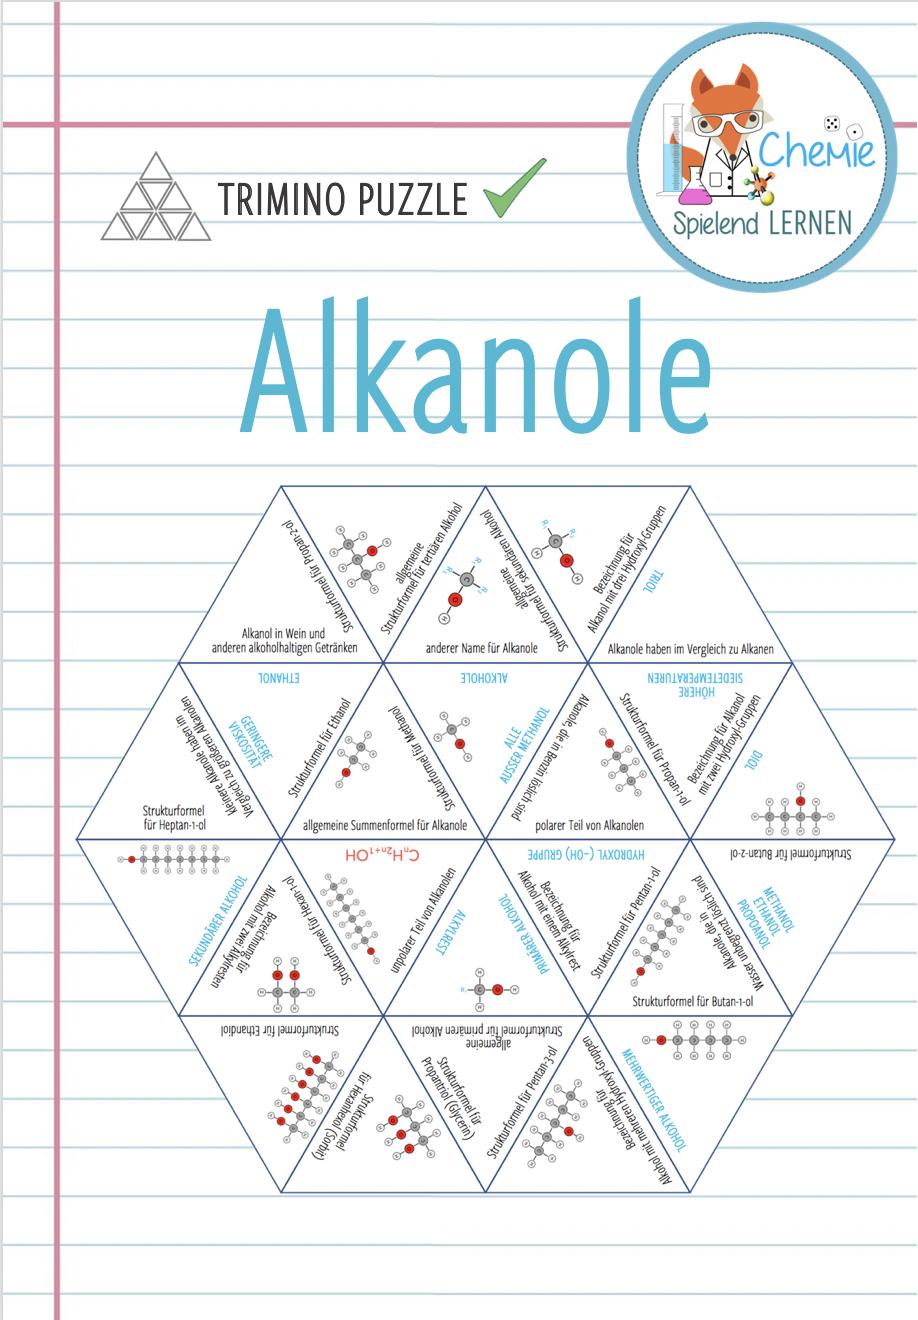 Alkanole Trimino Unterrichtsmaterial Im Fach Chemie Chemieunterricht Unterrichtsmaterial Lernen [ 1320 x 918 Pixel ]